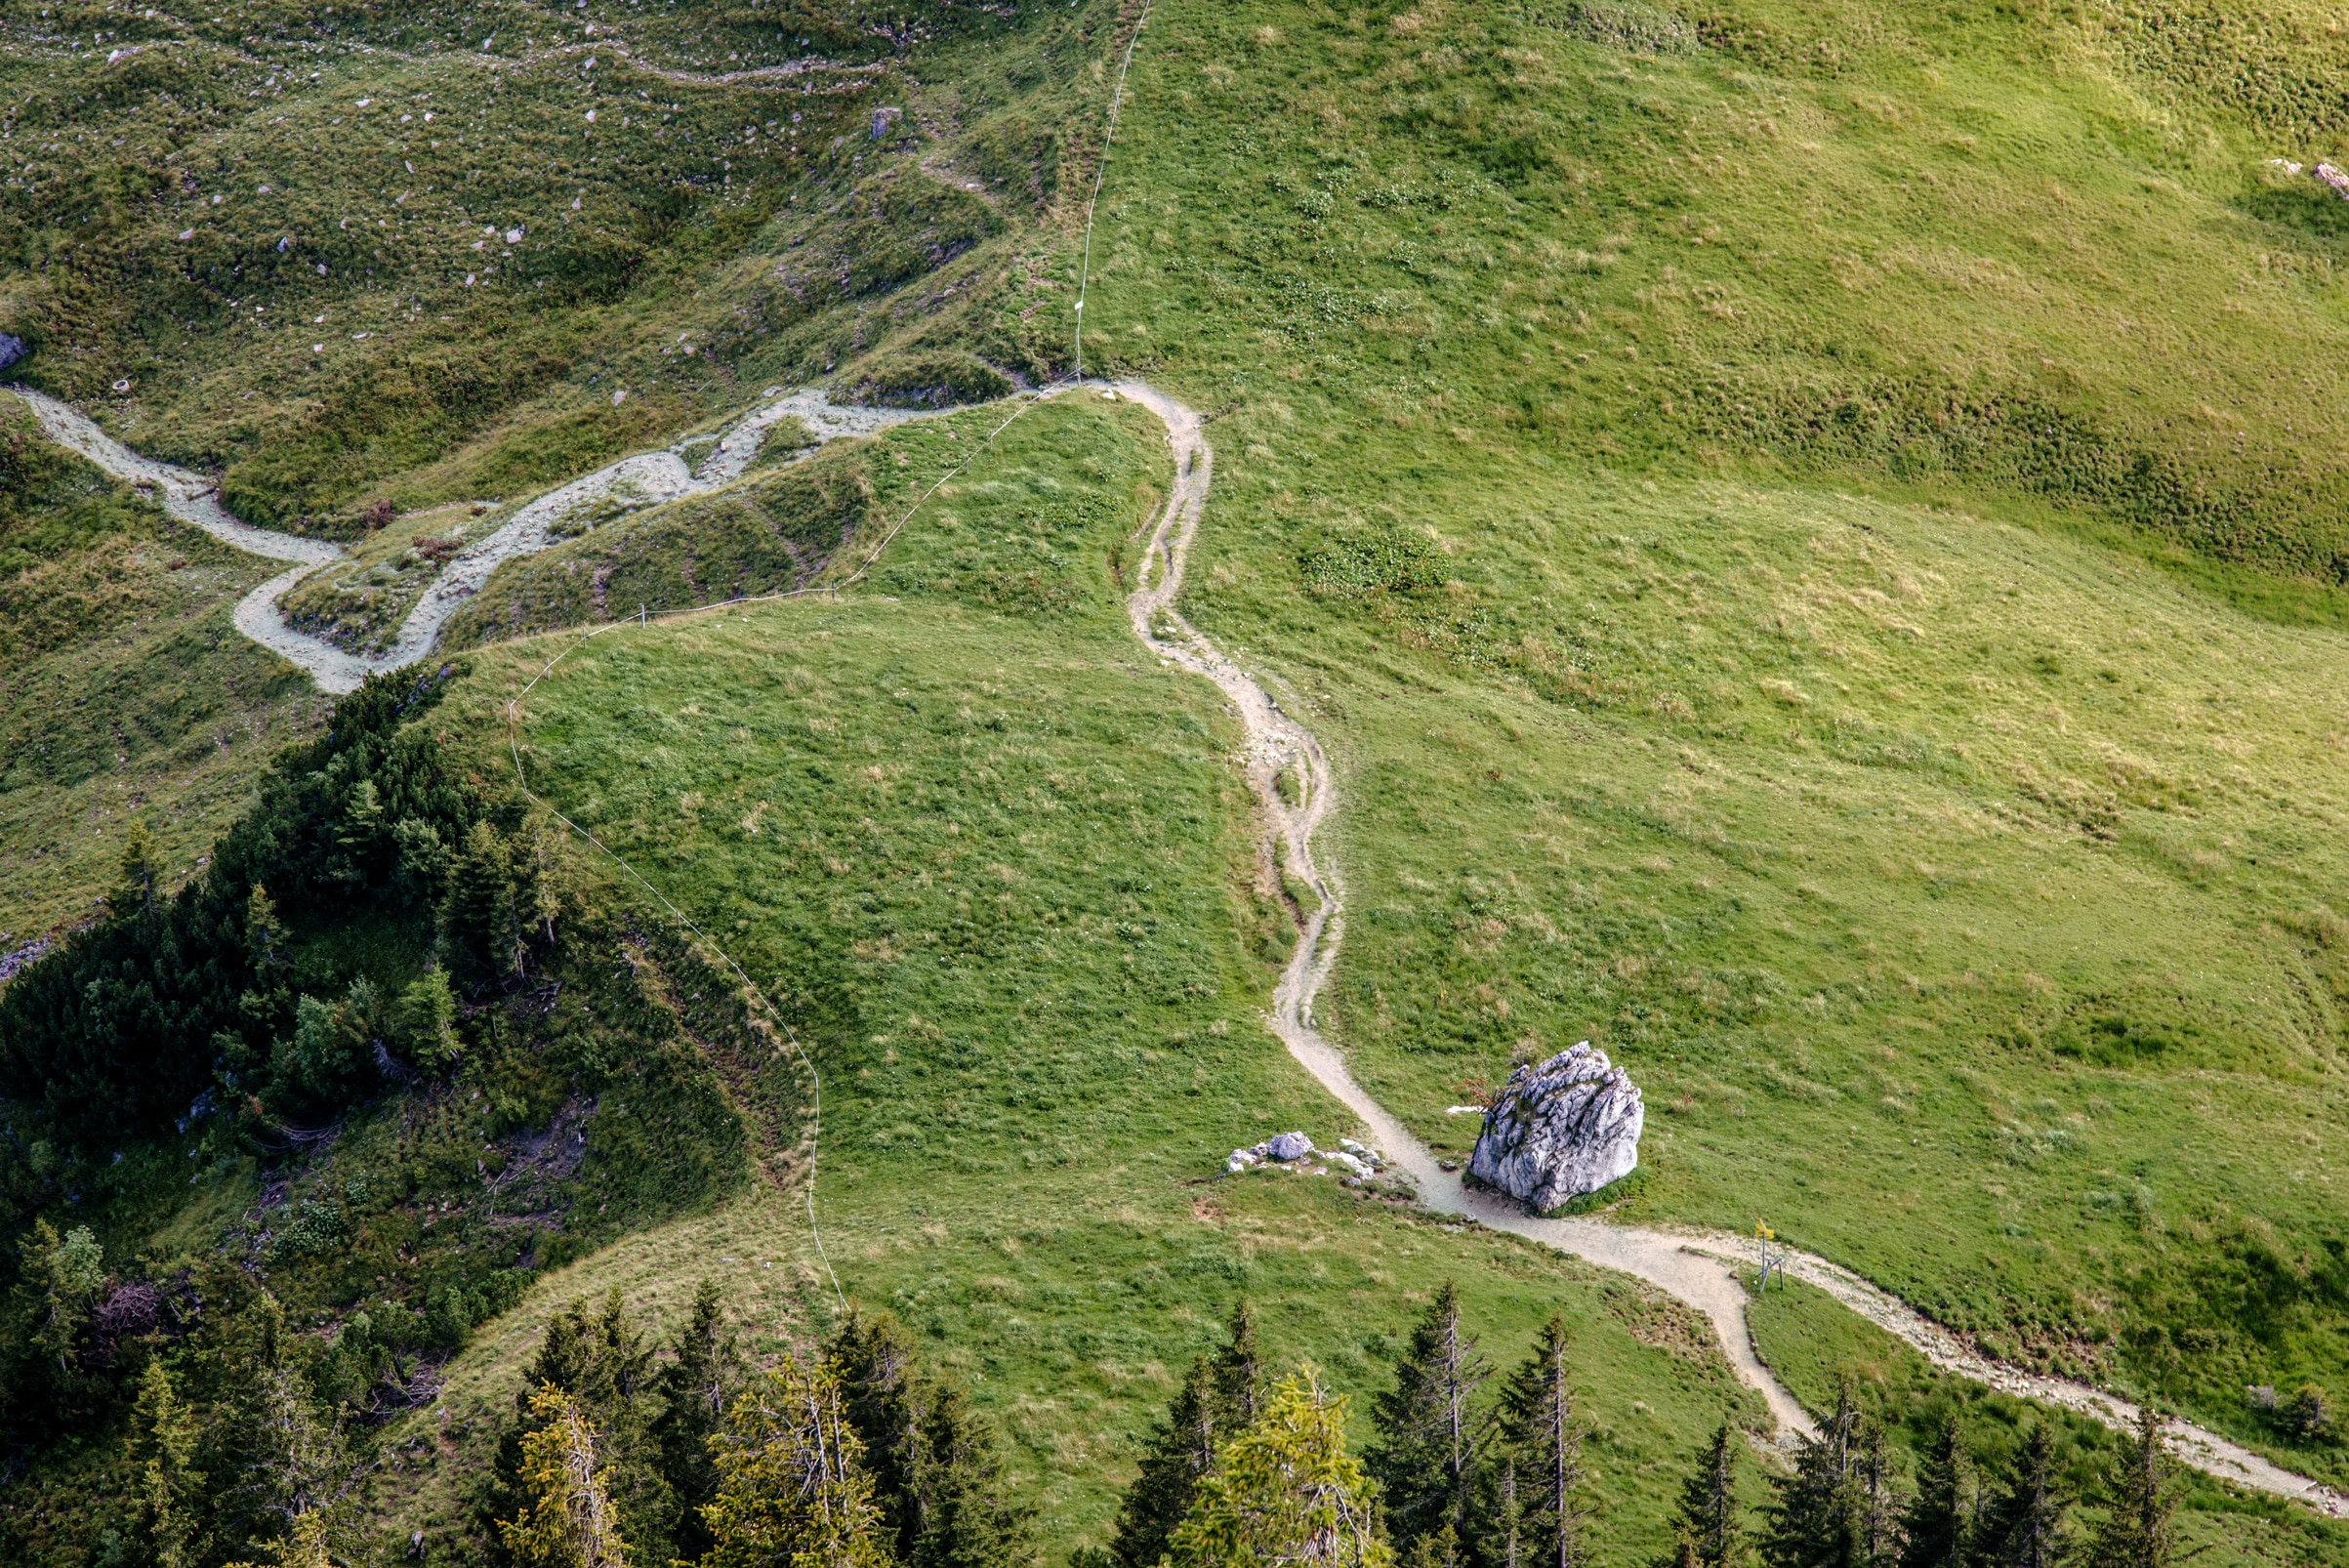 Klettersteig Tegernseer Hütte : Tegernseer hütte infos touren bergwelten